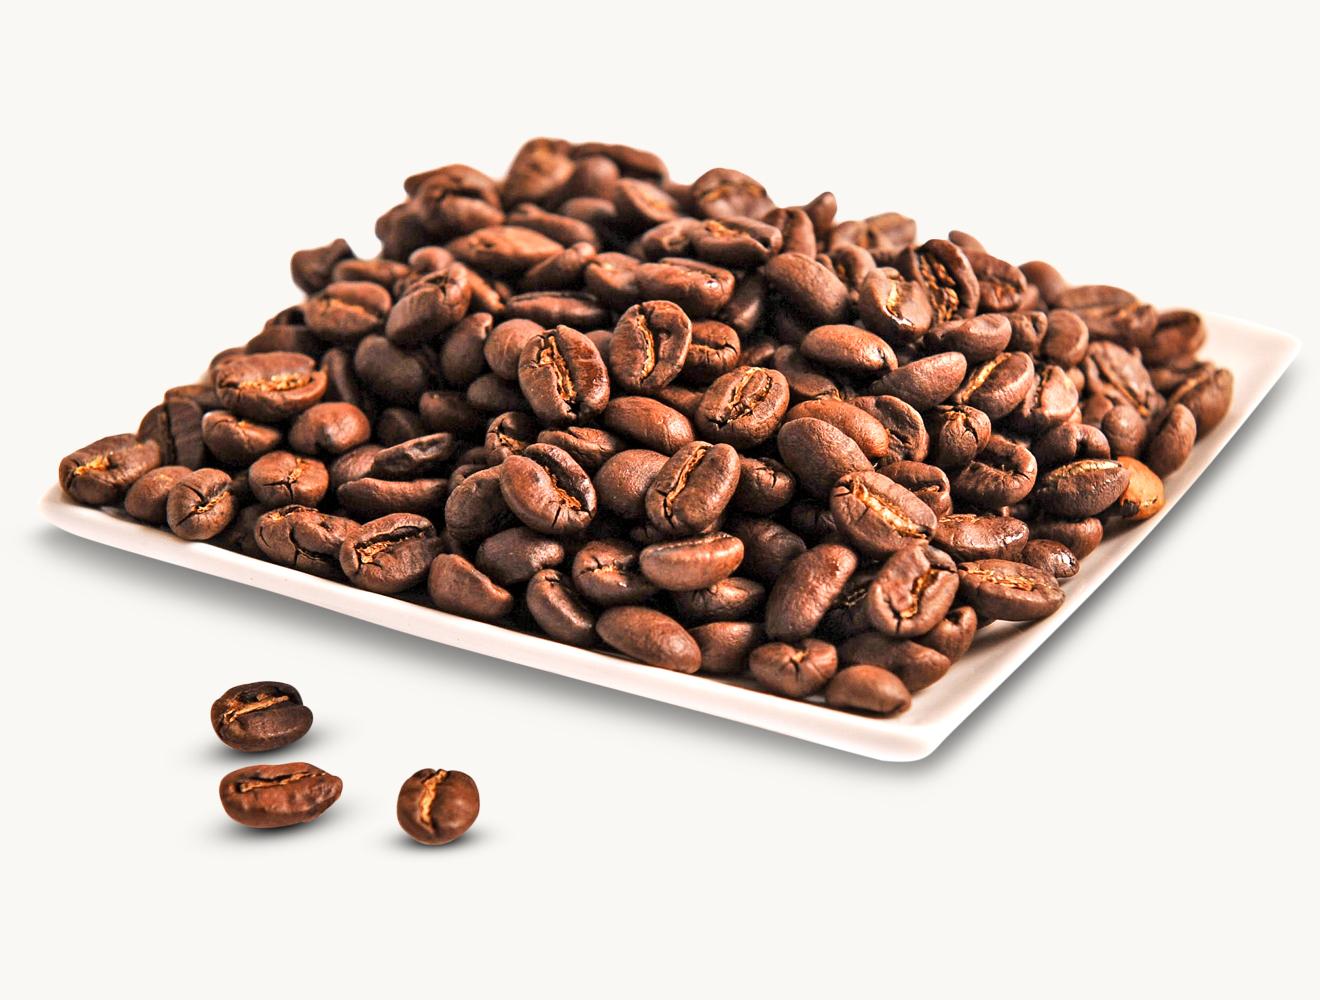 Hausmischung 100% Arabica Kaffee ganze Bohnen